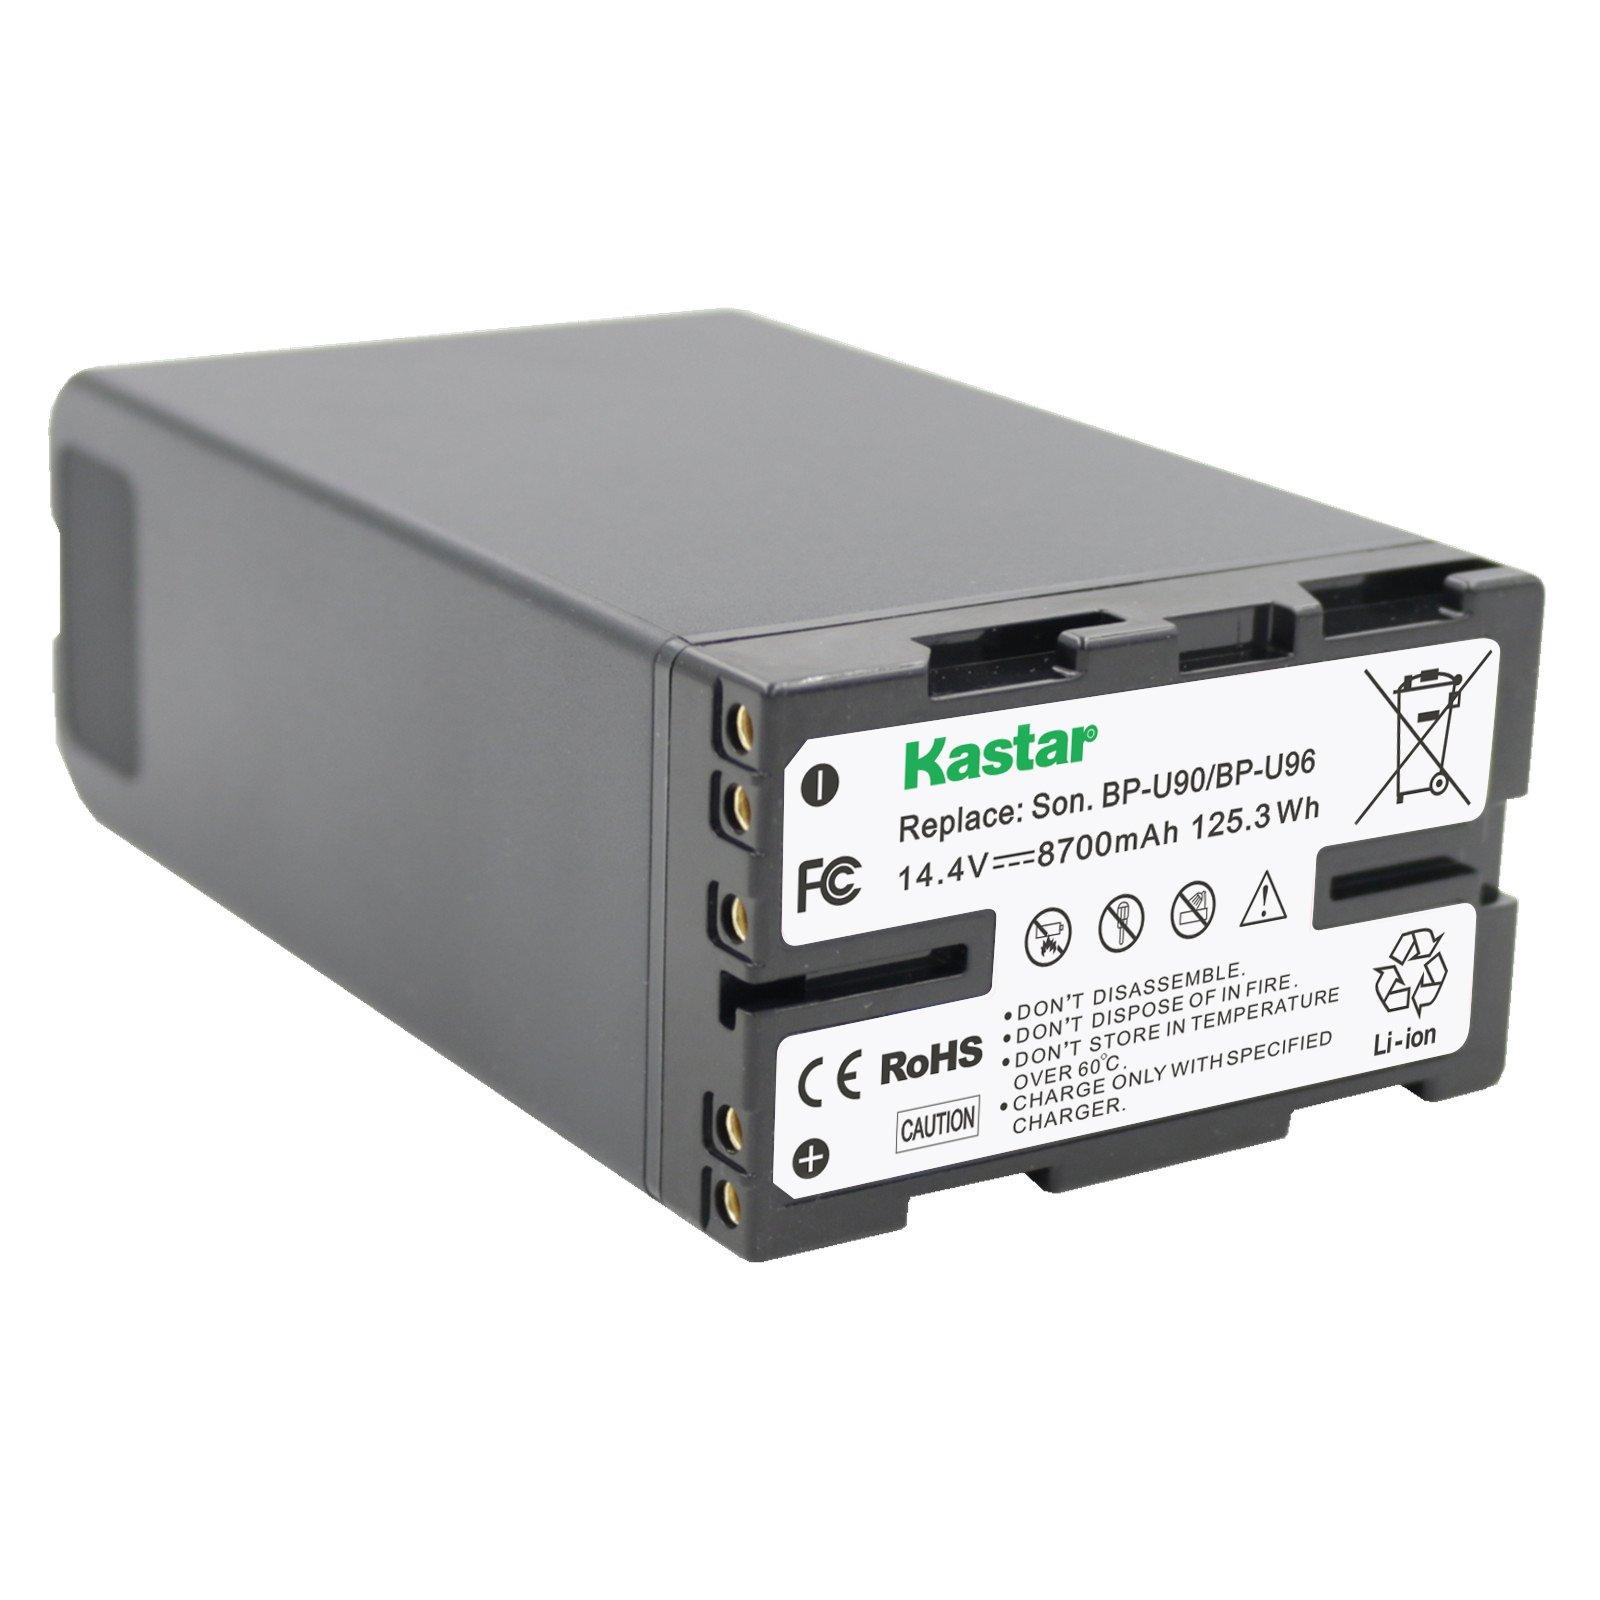 Kastar BP-U90 Battery for Sony BP-U30 BP-U60 BP-U65 BP-U66 BP-U96 and PXW-FS7 FS5 X 180 PMW-100 150 150P 160 PMW-200 300 PMW-EX1 EX1R PMW-EX3 EX3R PMW-EX160 PMW-EX260 PMW-EX280 PMW-F3 PMW-F3K PMW-F3L